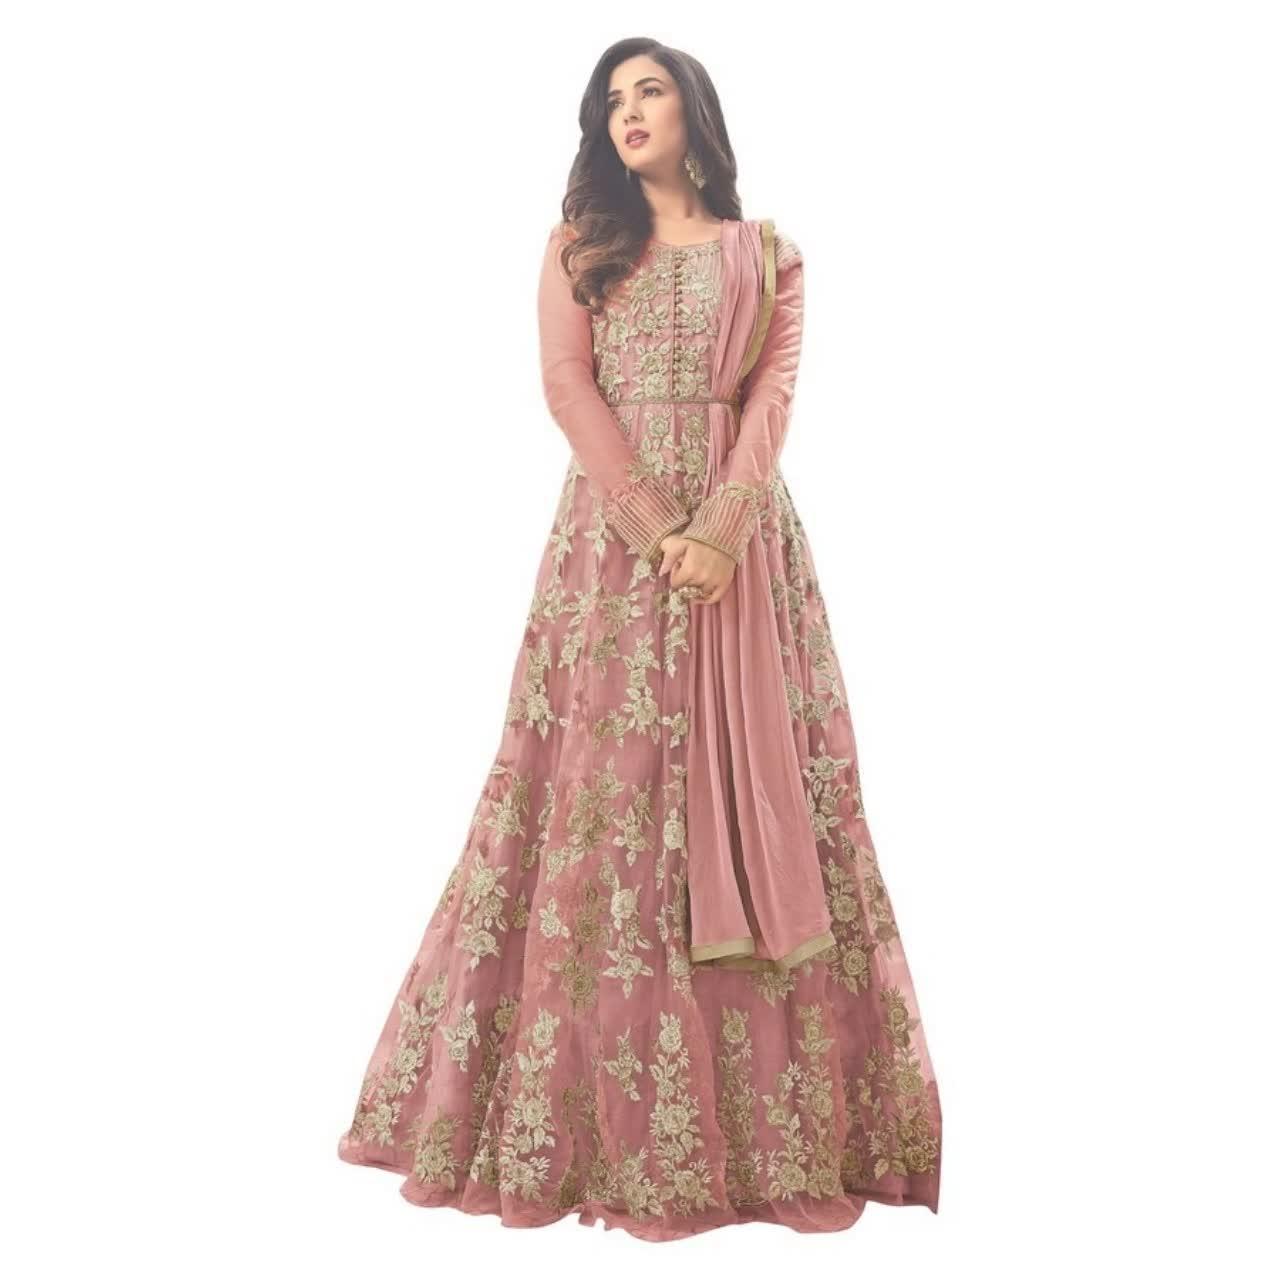 Salwar kameez สูทออกแบบอินเดียปากีสถาน chudidar สนามหญ้าชุดปัญจาบชุดวัสดุ PARTY งานแต่งงานผู้หญิงสวมใส่